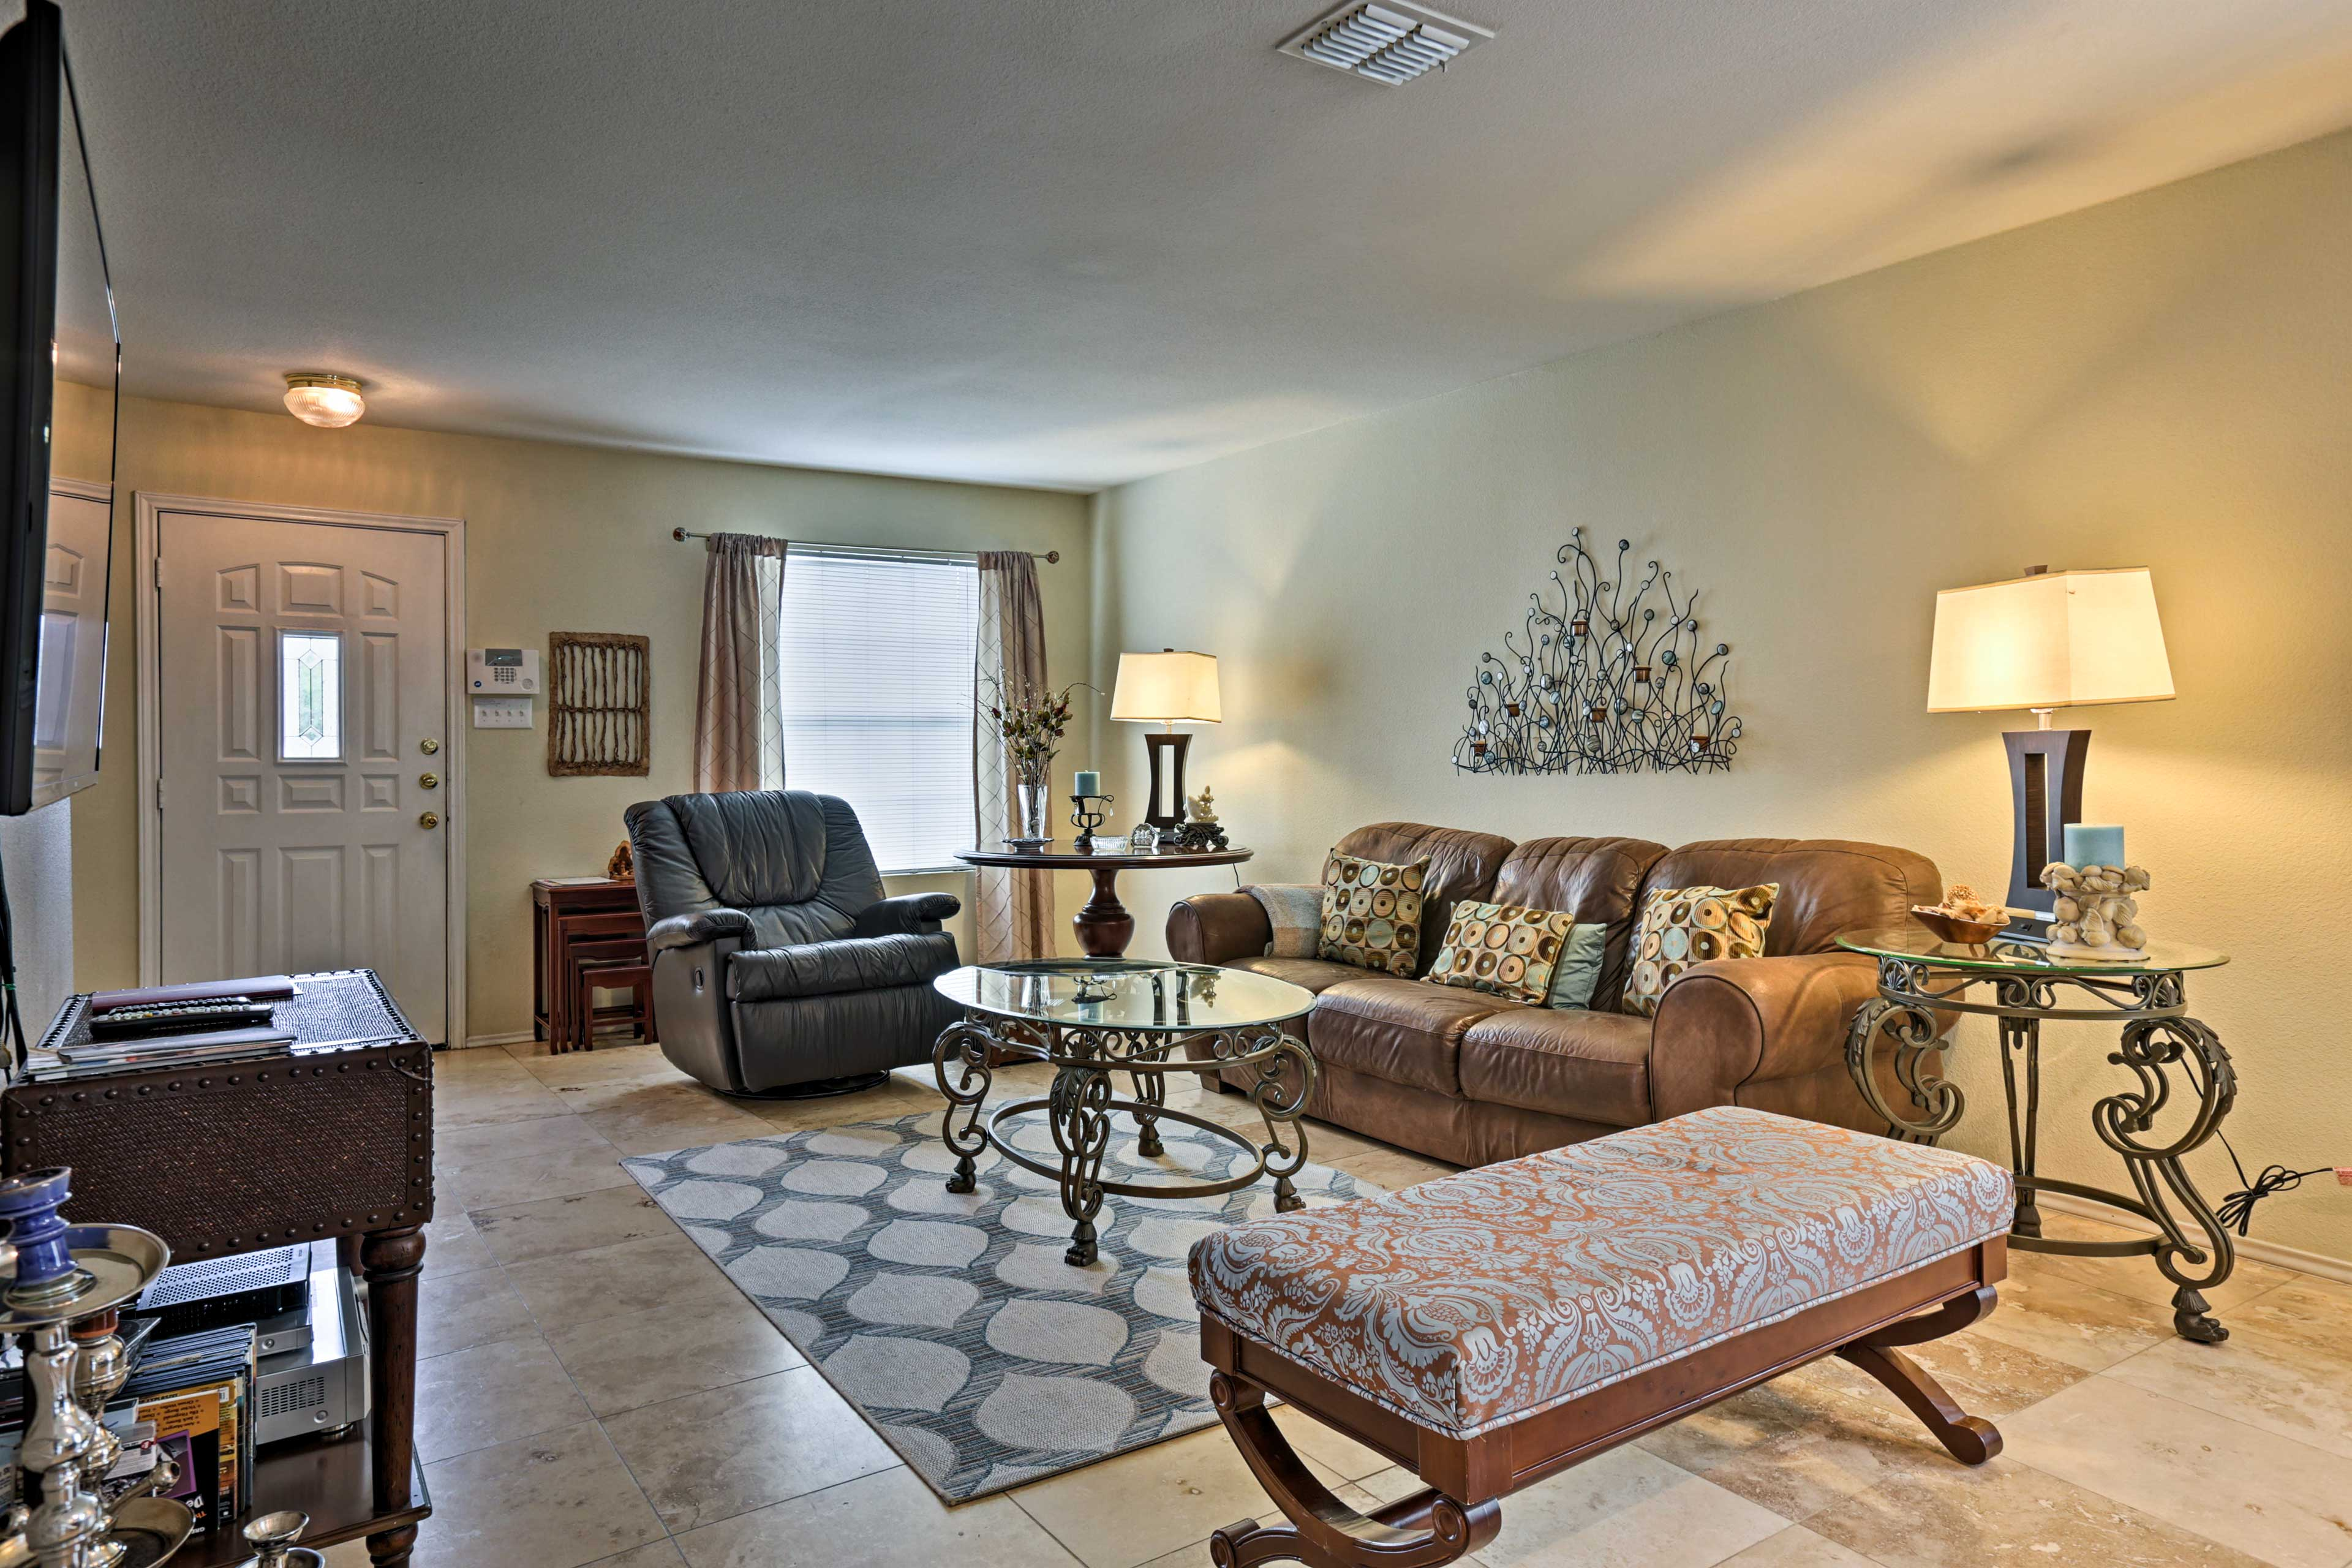 San Antonio Vacation Rental | 2-Story Home | 3BR | 2BA | 2,044 Sq Ft